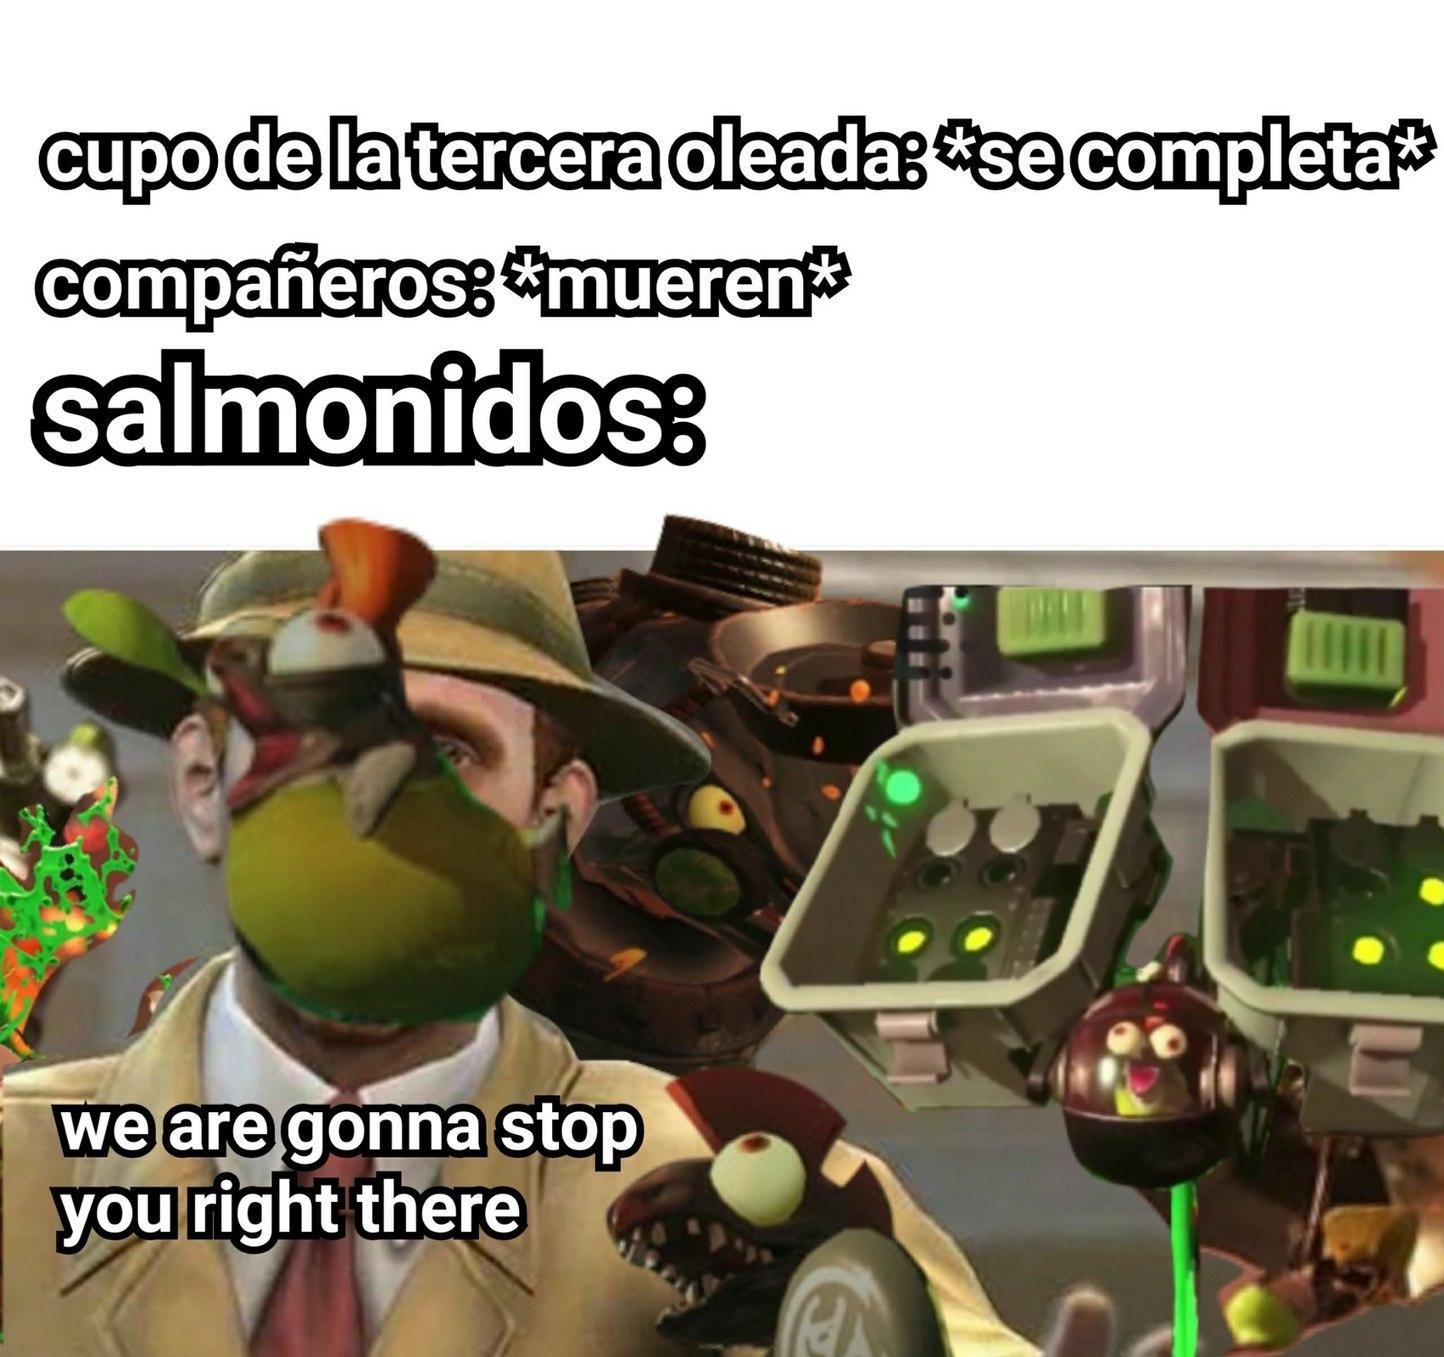 Salmon run un a nutshell - meme